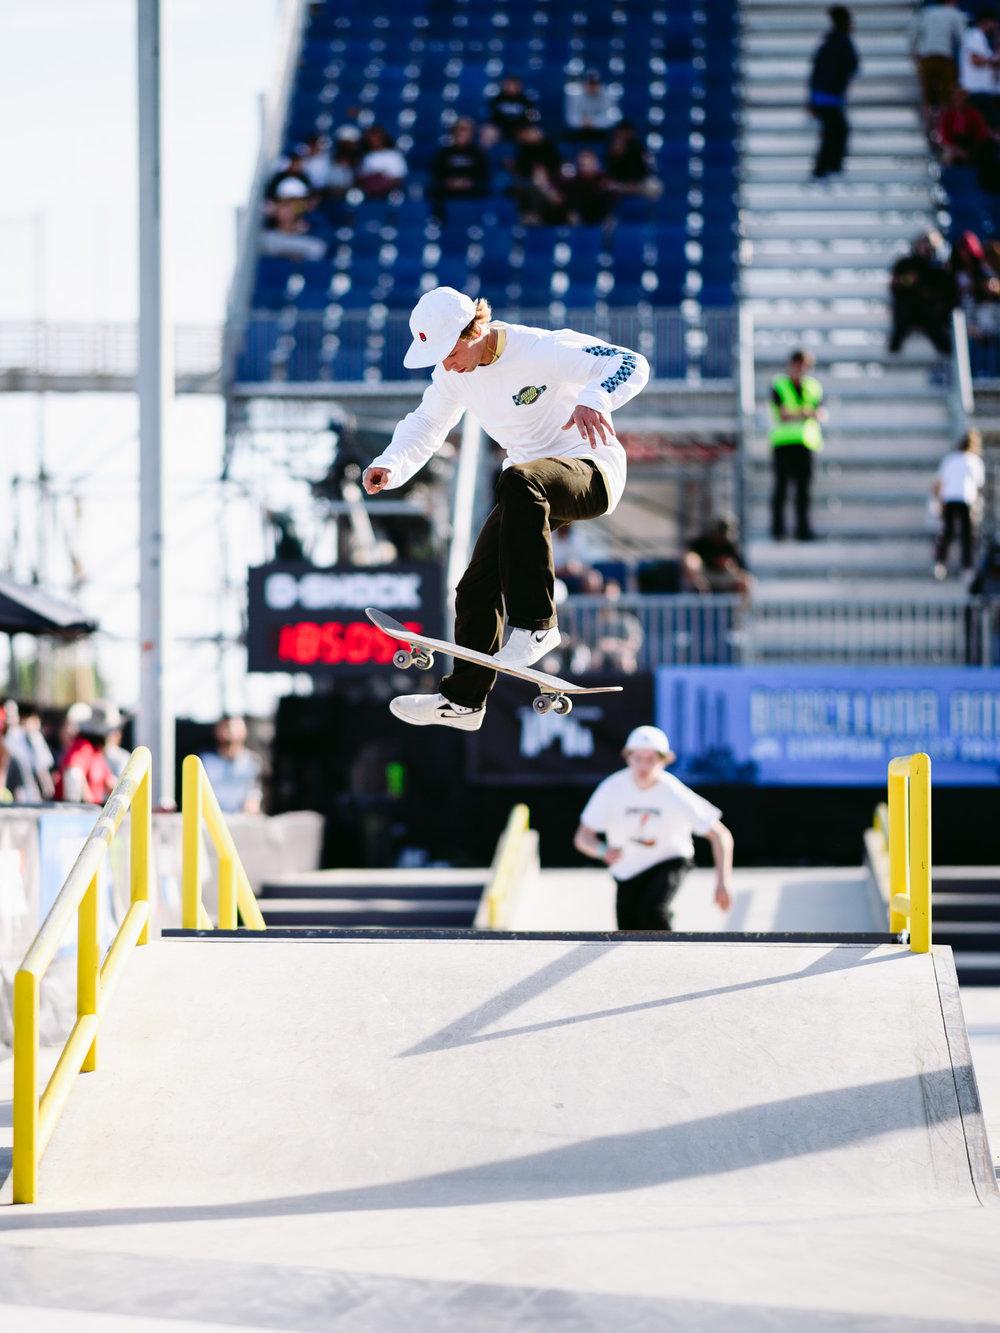 Justin Sommer 360 Flip